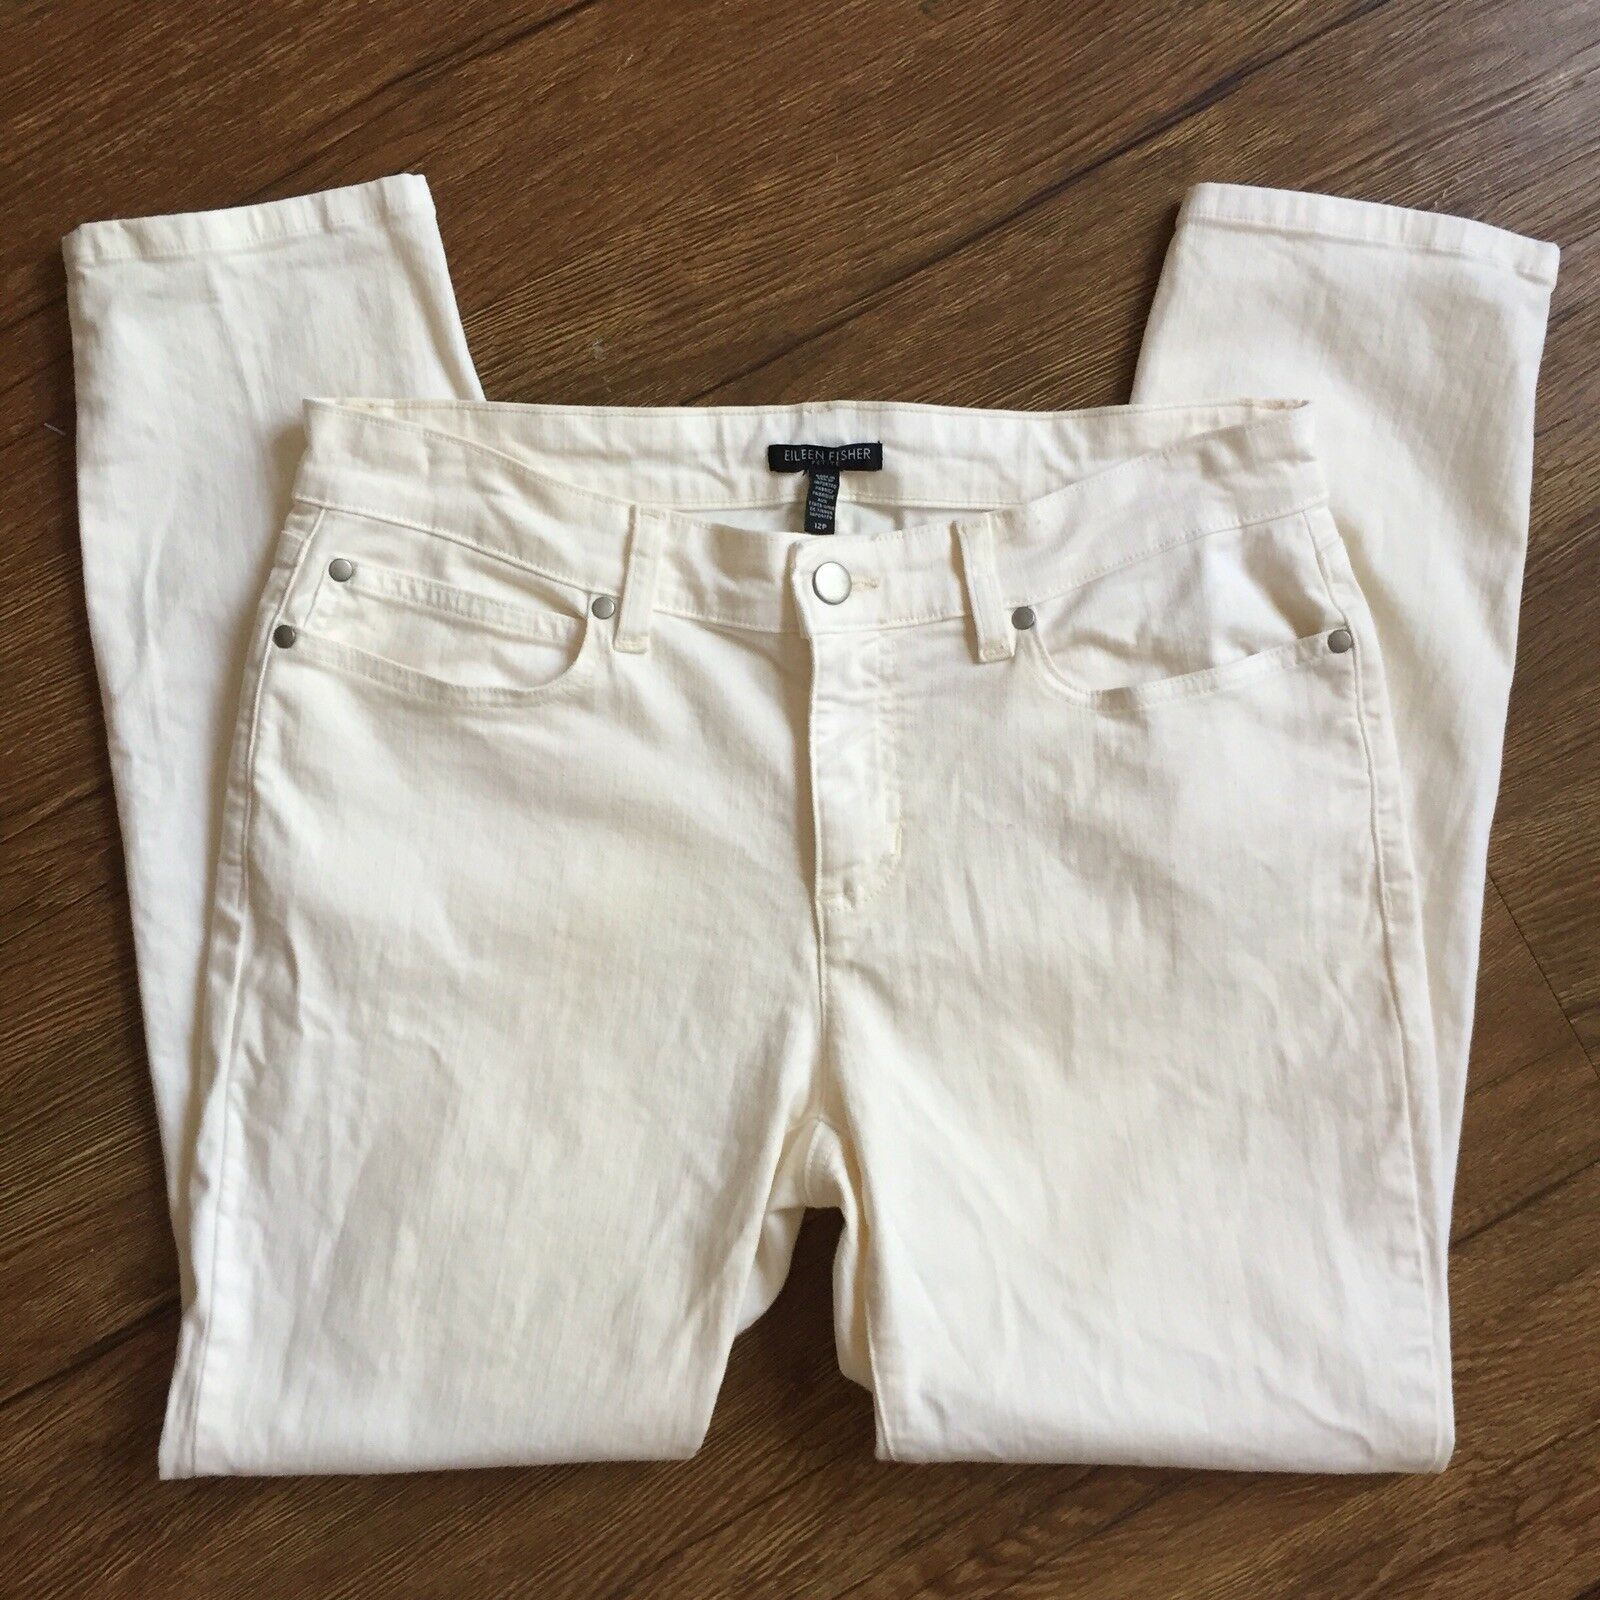 Eileen Fisher Womens White Jeans Skinny Slim Petite Size 12 P